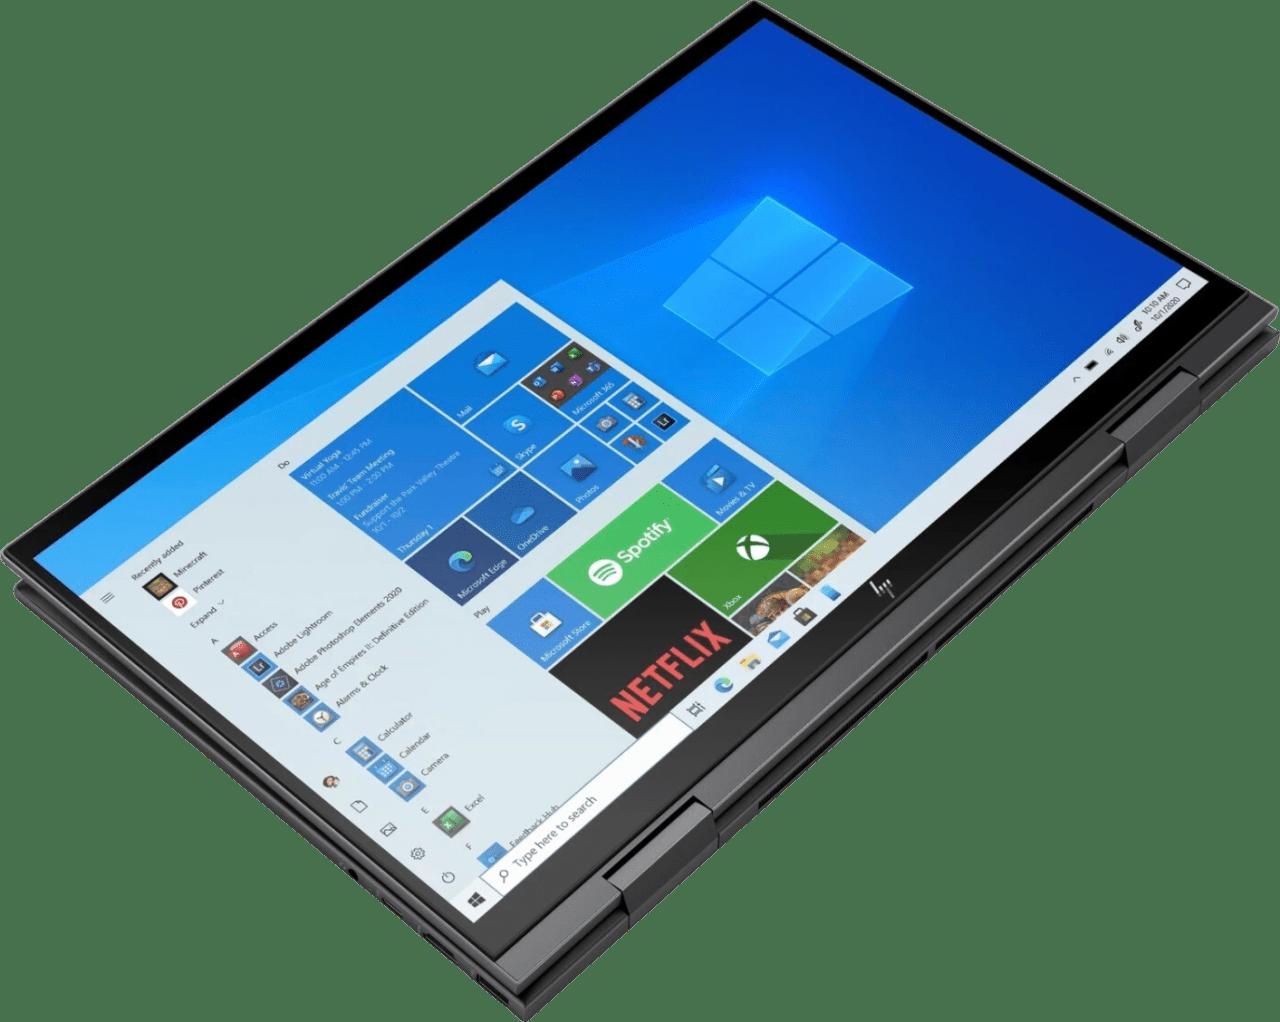 Black HP Envy x360 15-eu0356ng Convertible - AMD Ryzen™ 5 5500U - 8GB - 1TB SSD - AMD Radeon™ Graphics.3